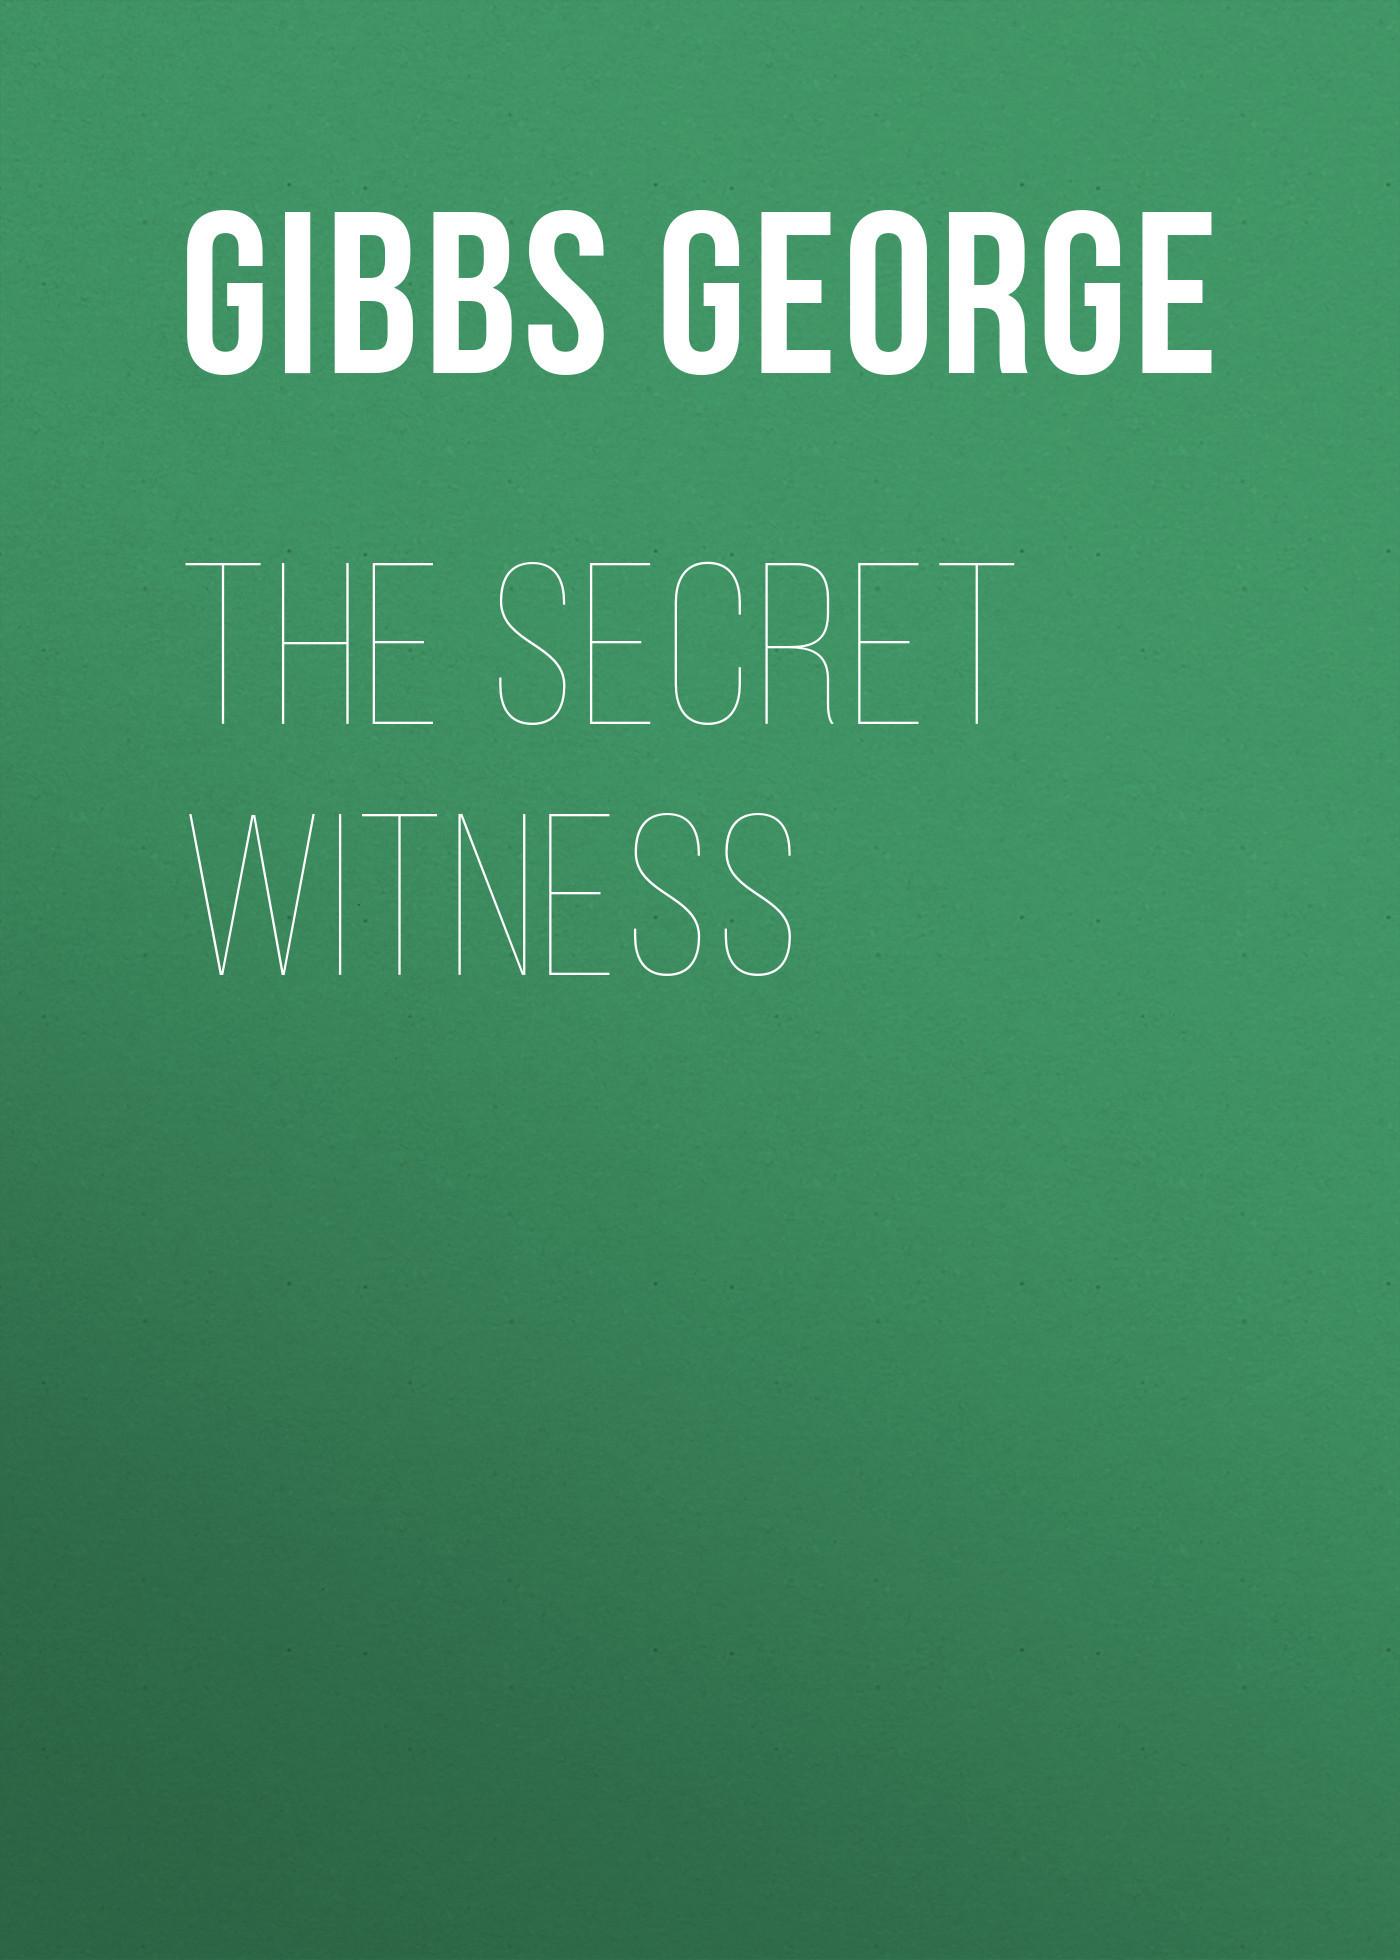 Gibbs George The Secret Witness joe gibbs autographed hand signed washington redskins 8x10 photo with hof 96 inscription